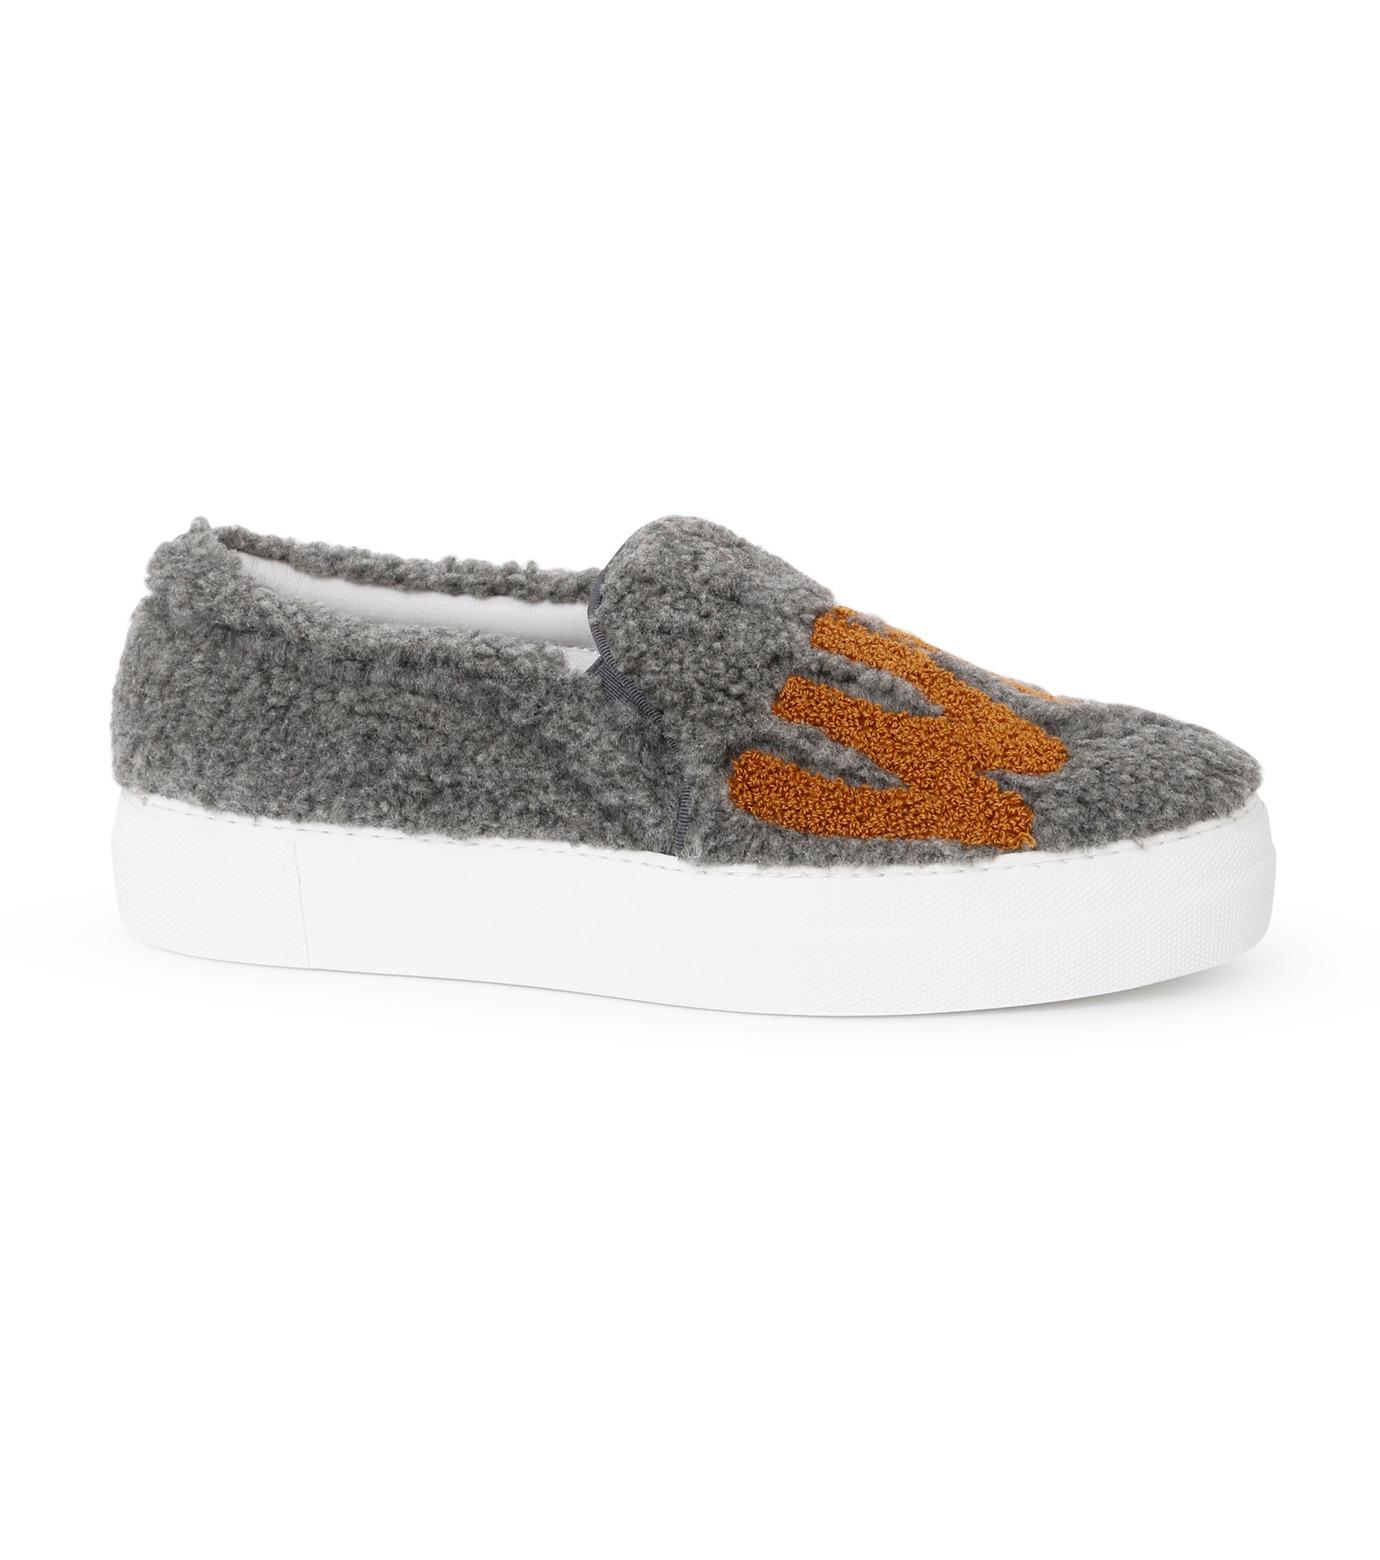 Joshua SANDERS(ジョシュア・サンダース)のSlip On Grey What-GRAY(スニーカー/sneaker)-10078S-11 拡大詳細画像1